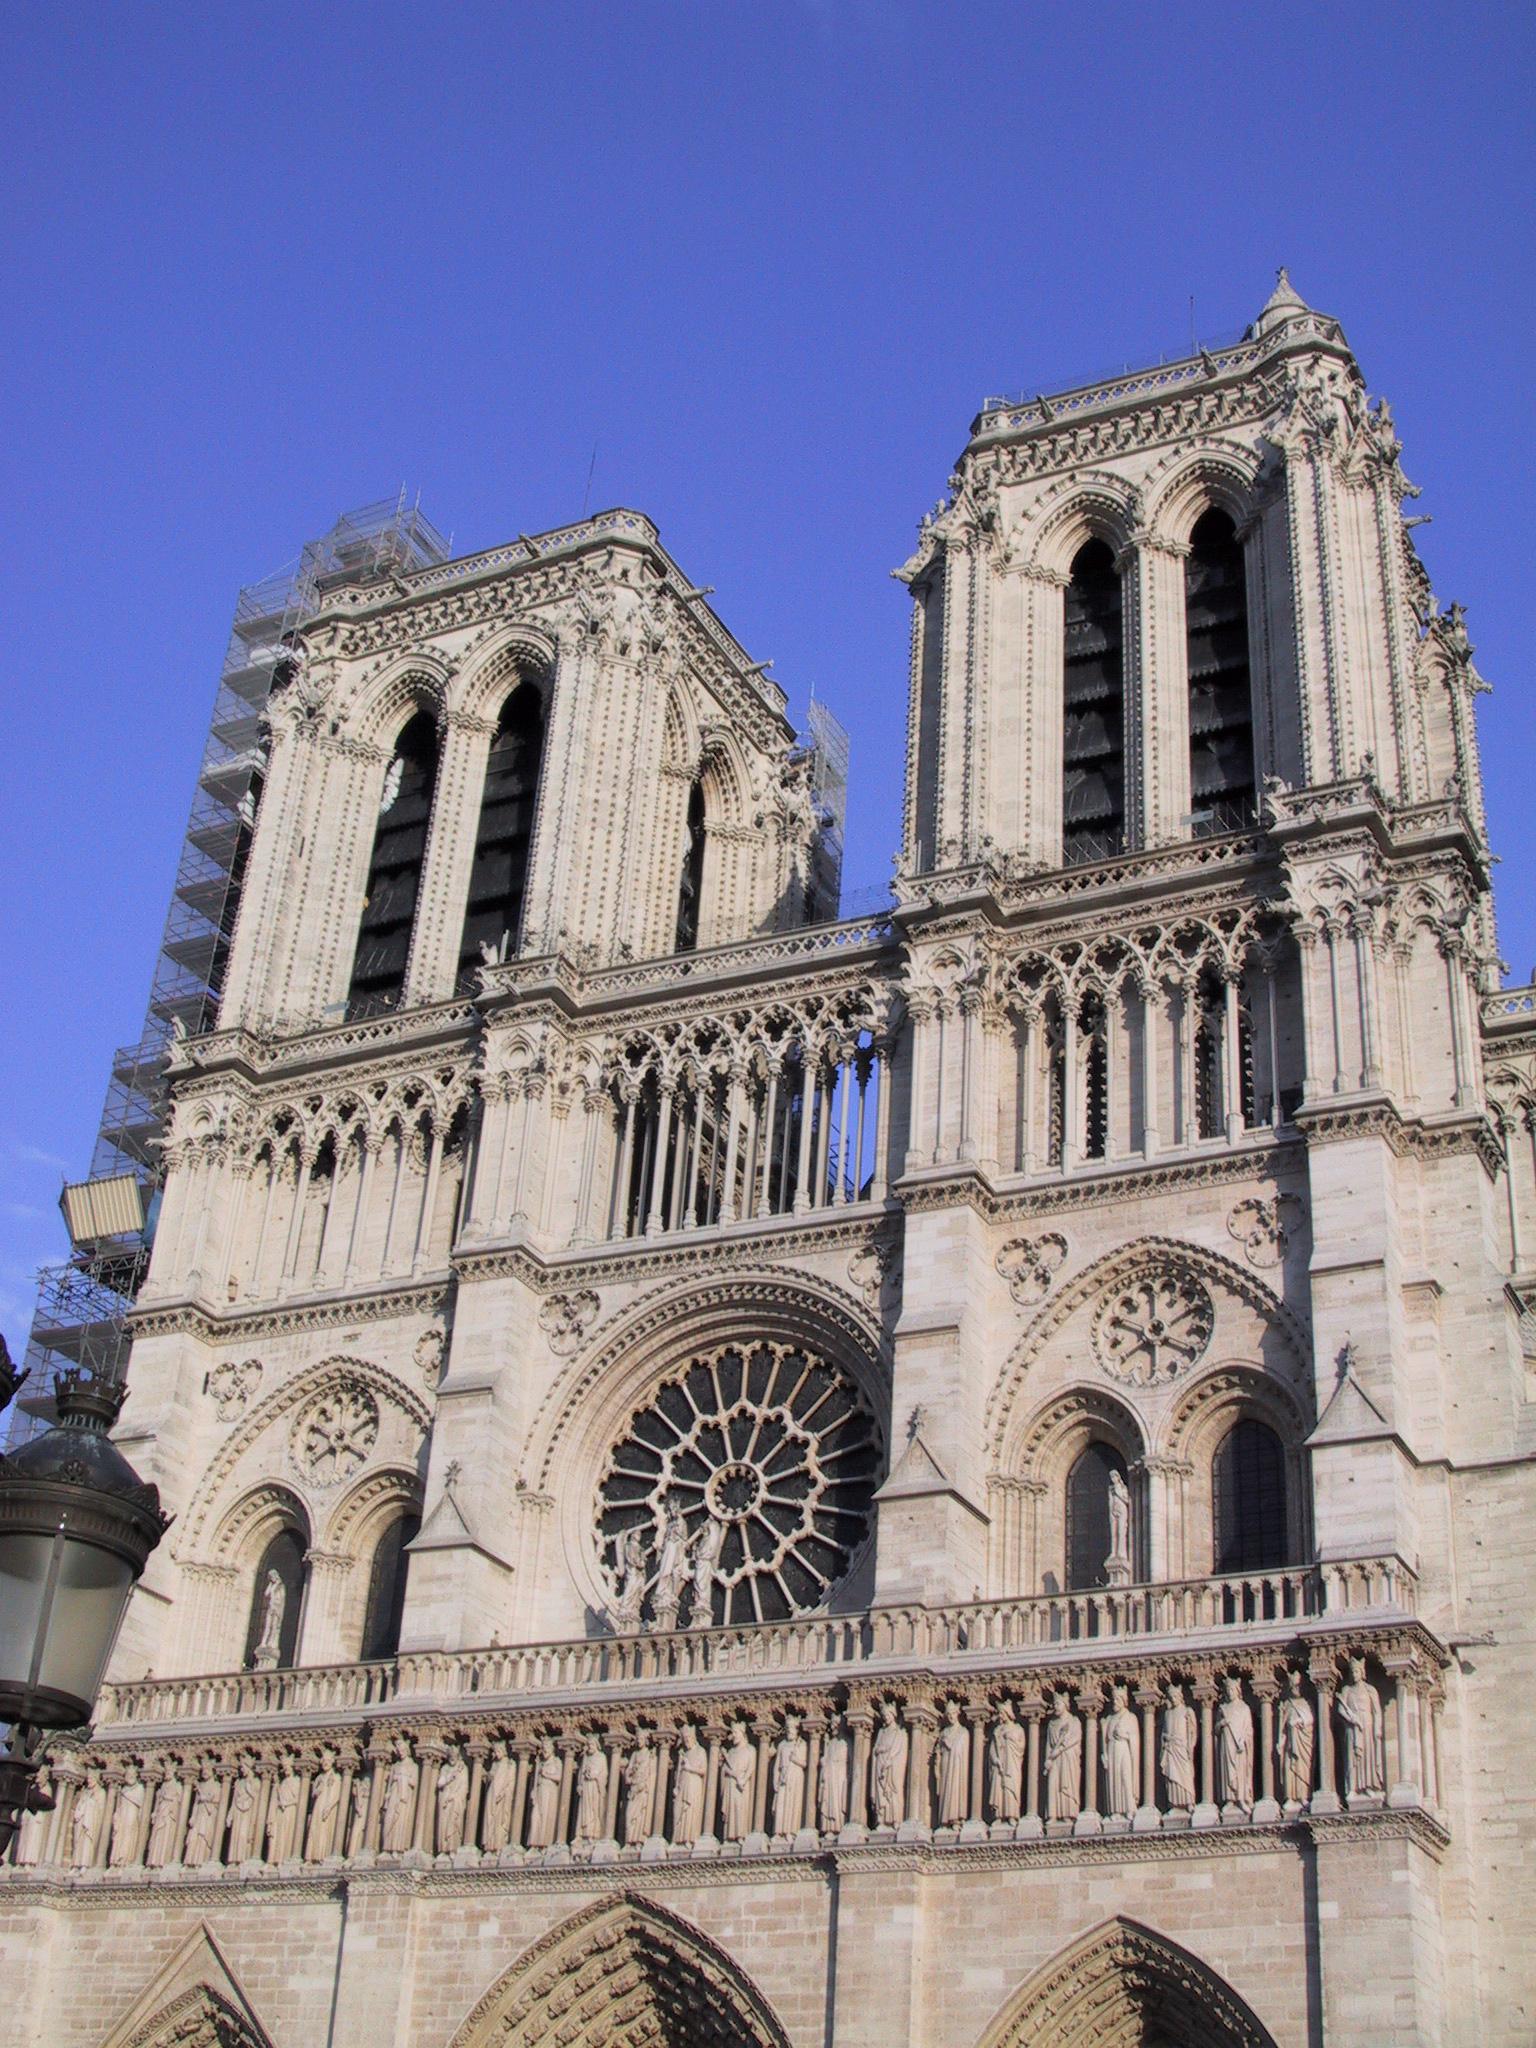 https://upload.wikimedia.org/wikipedia/commons/0/0e/Notre_Dame_Front.jpg